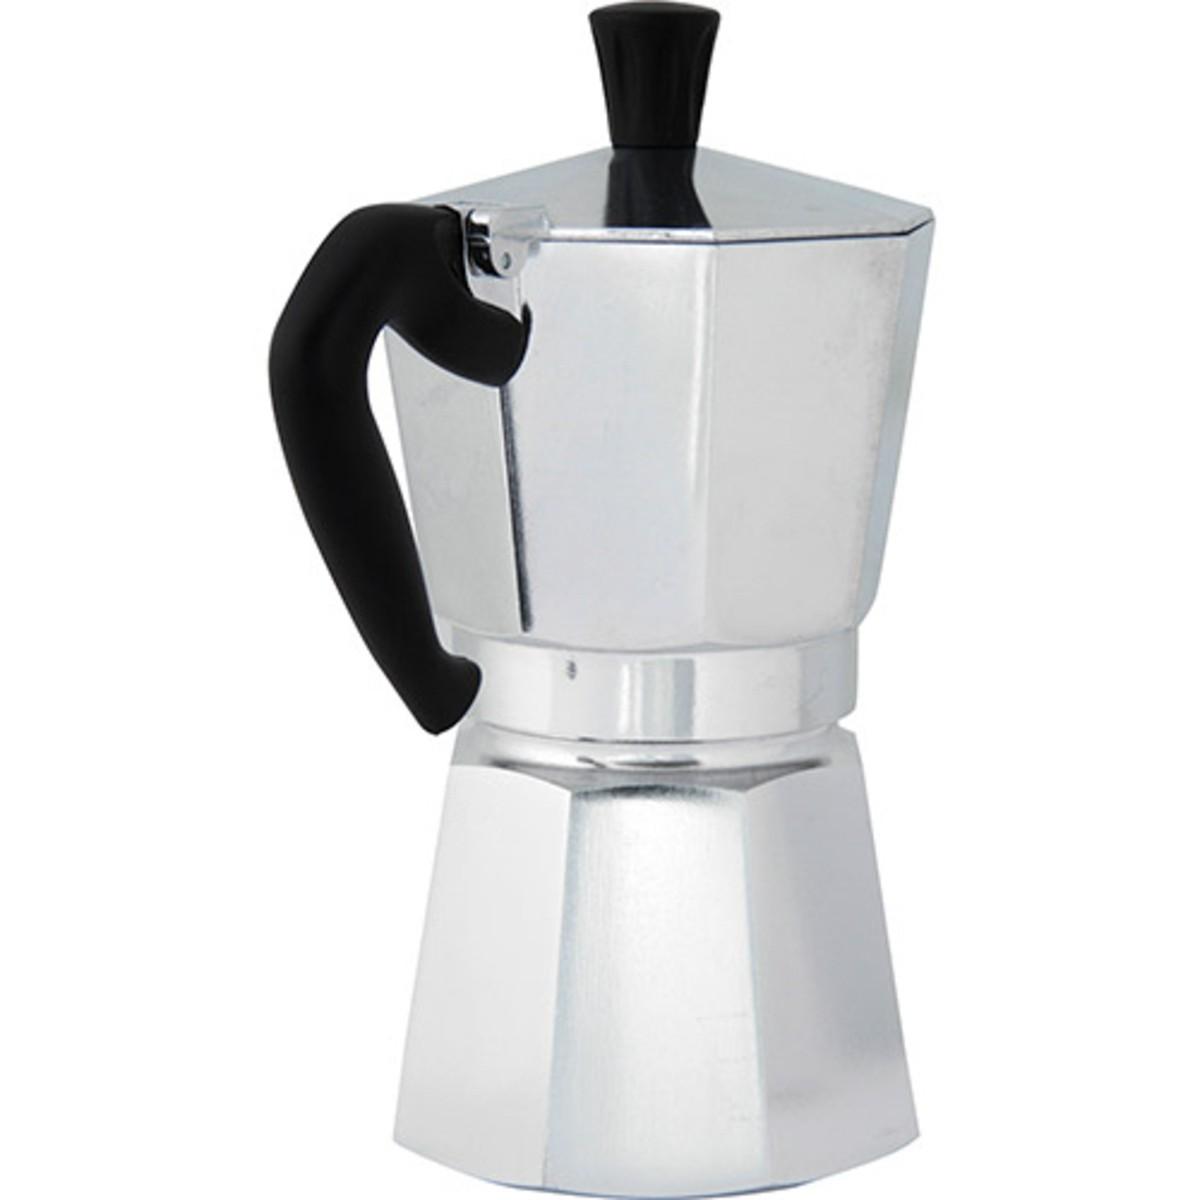 Cafeteira 6 Xícaras para Fogão Mooka Express Prata Bialetti